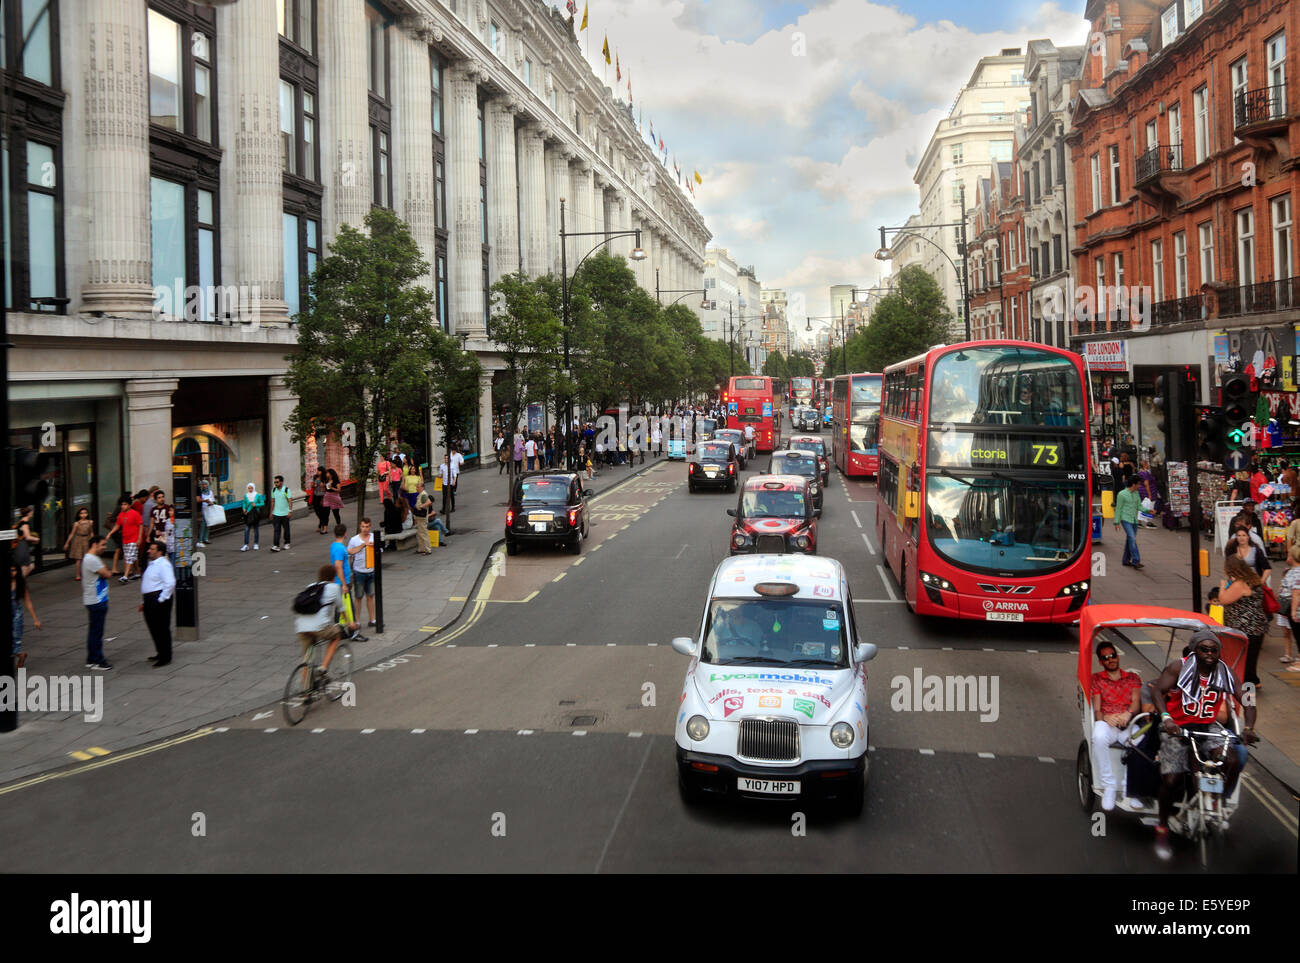 Selfridges Store in Oxford Street London West End - Stock Image